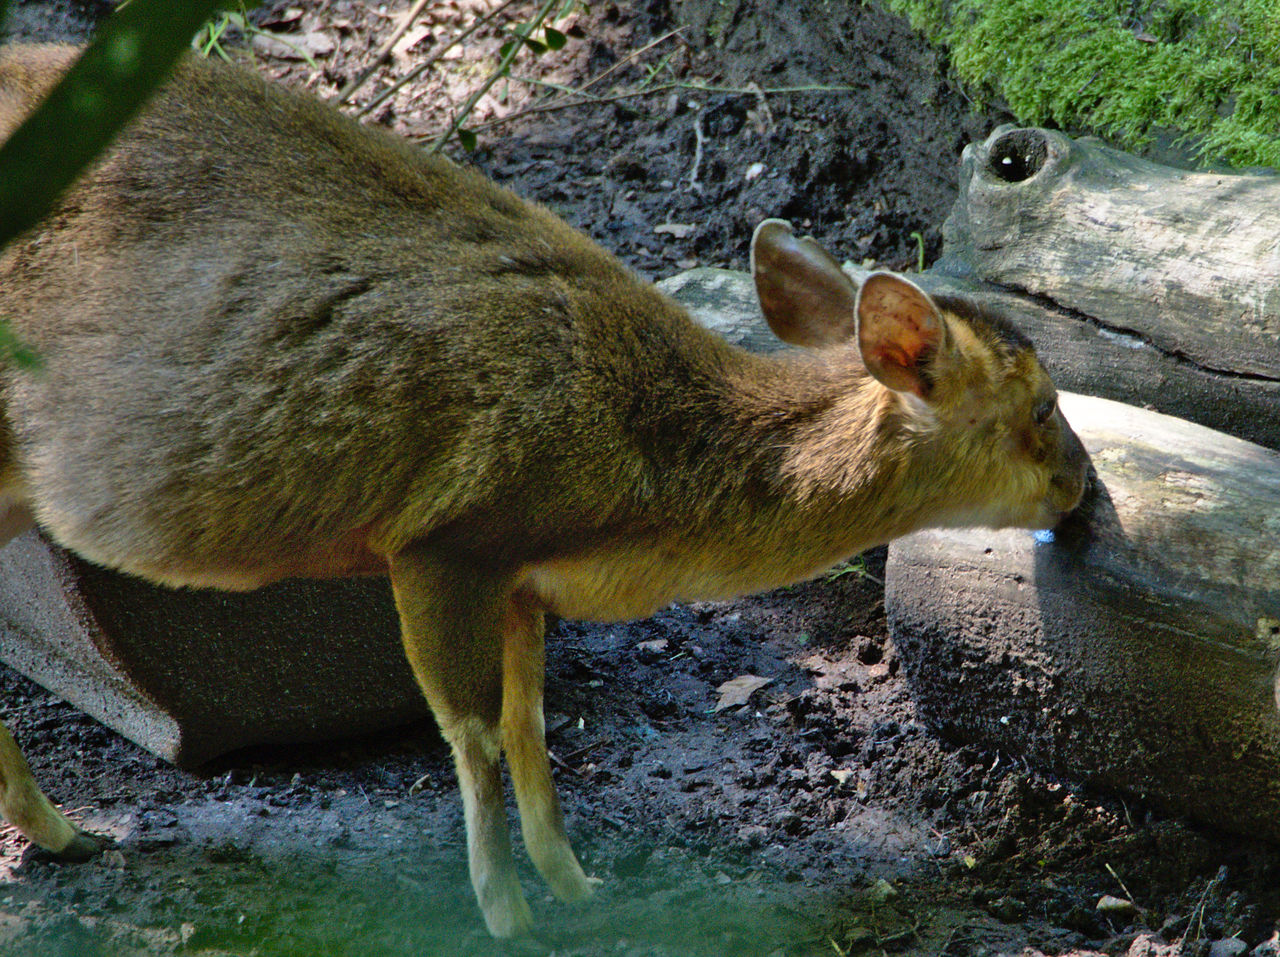 20190613_Zoo_Landau_002